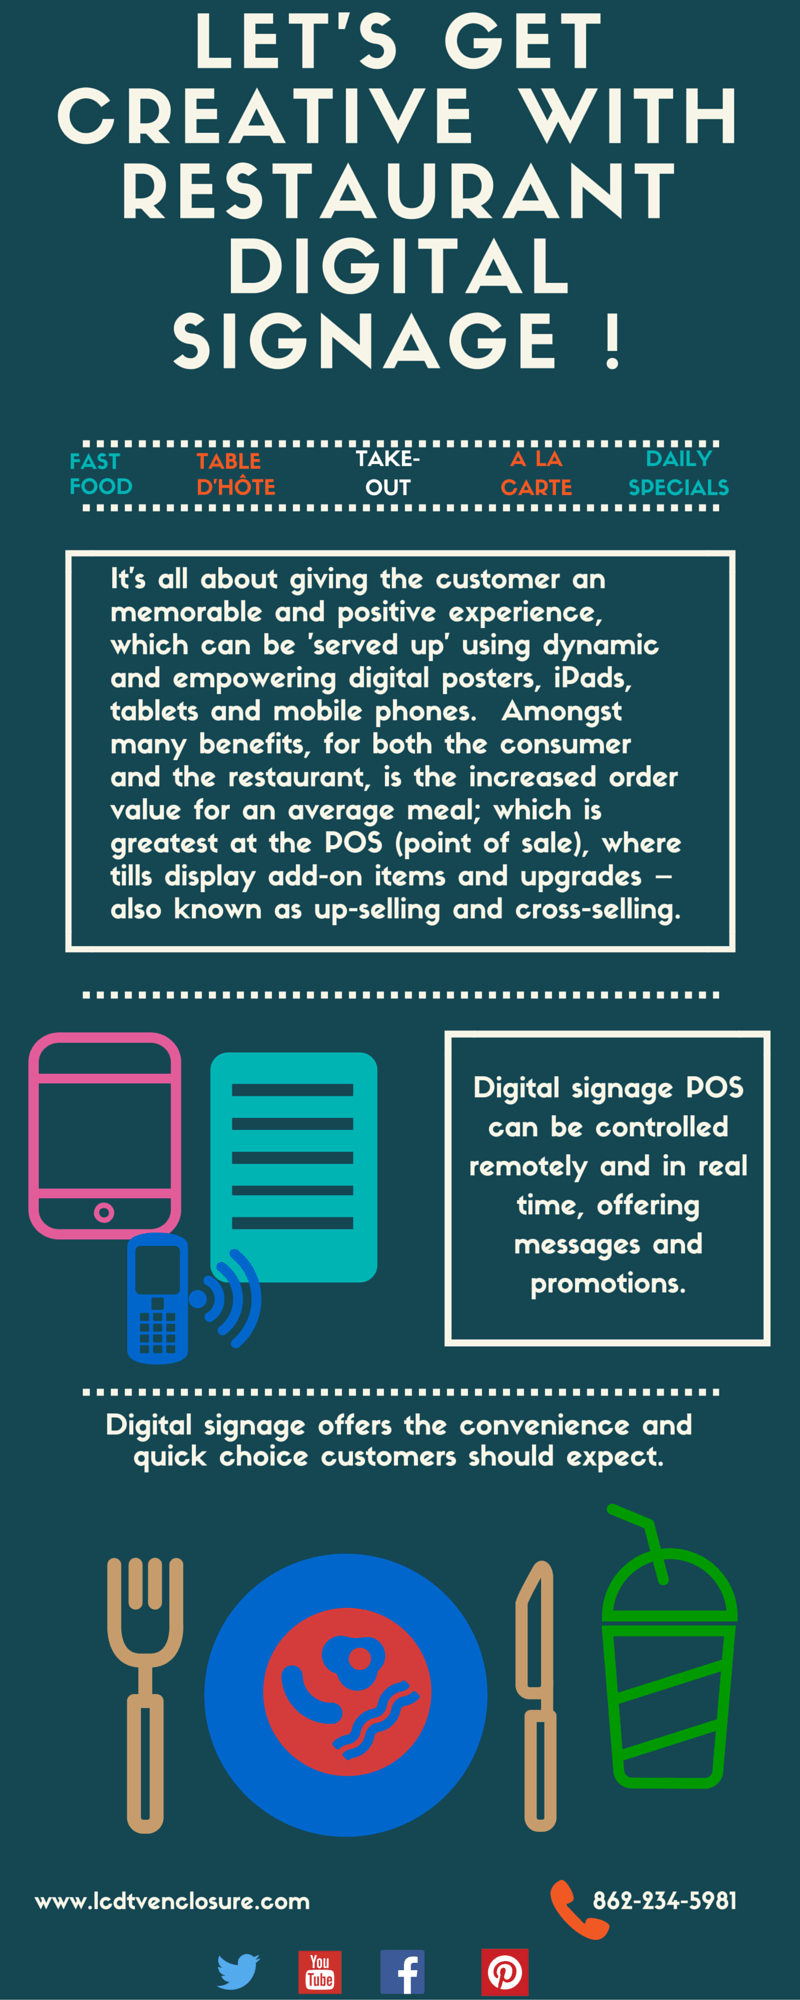 Creative Restaurant Digital Signage Infographic ProEnc